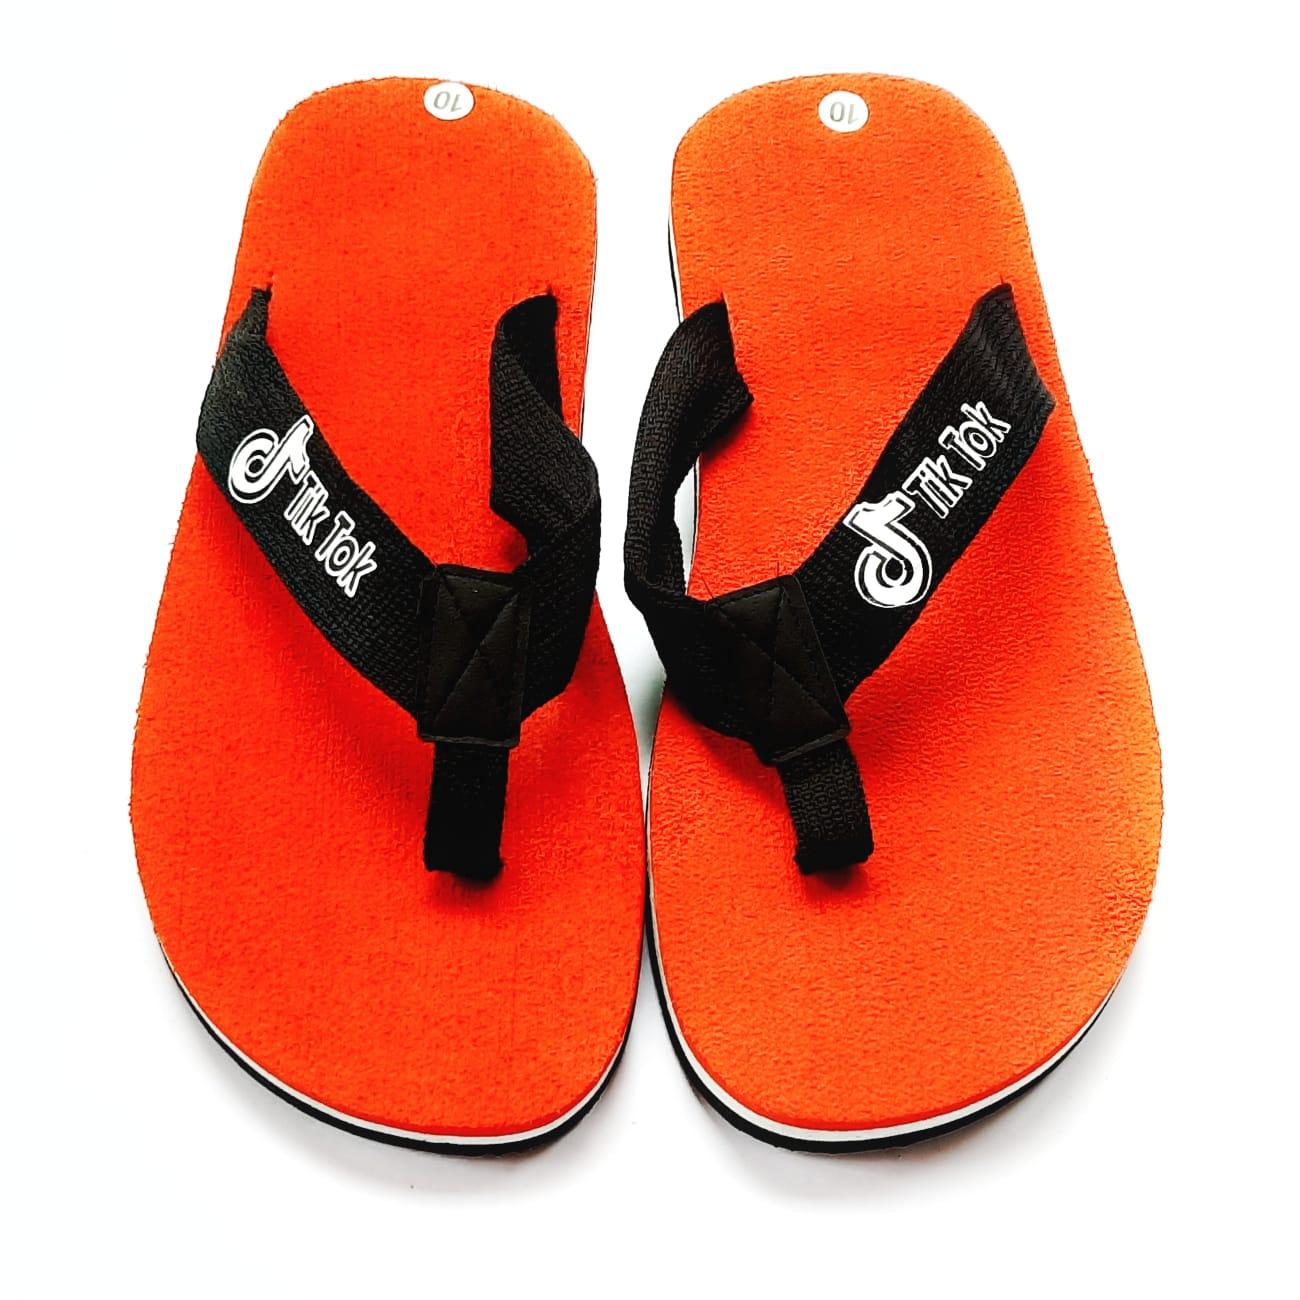 Casual Slipper for Man Home Flip Flop Chappal Beach Flipflop soft Chapal Slippers Men's Sandals